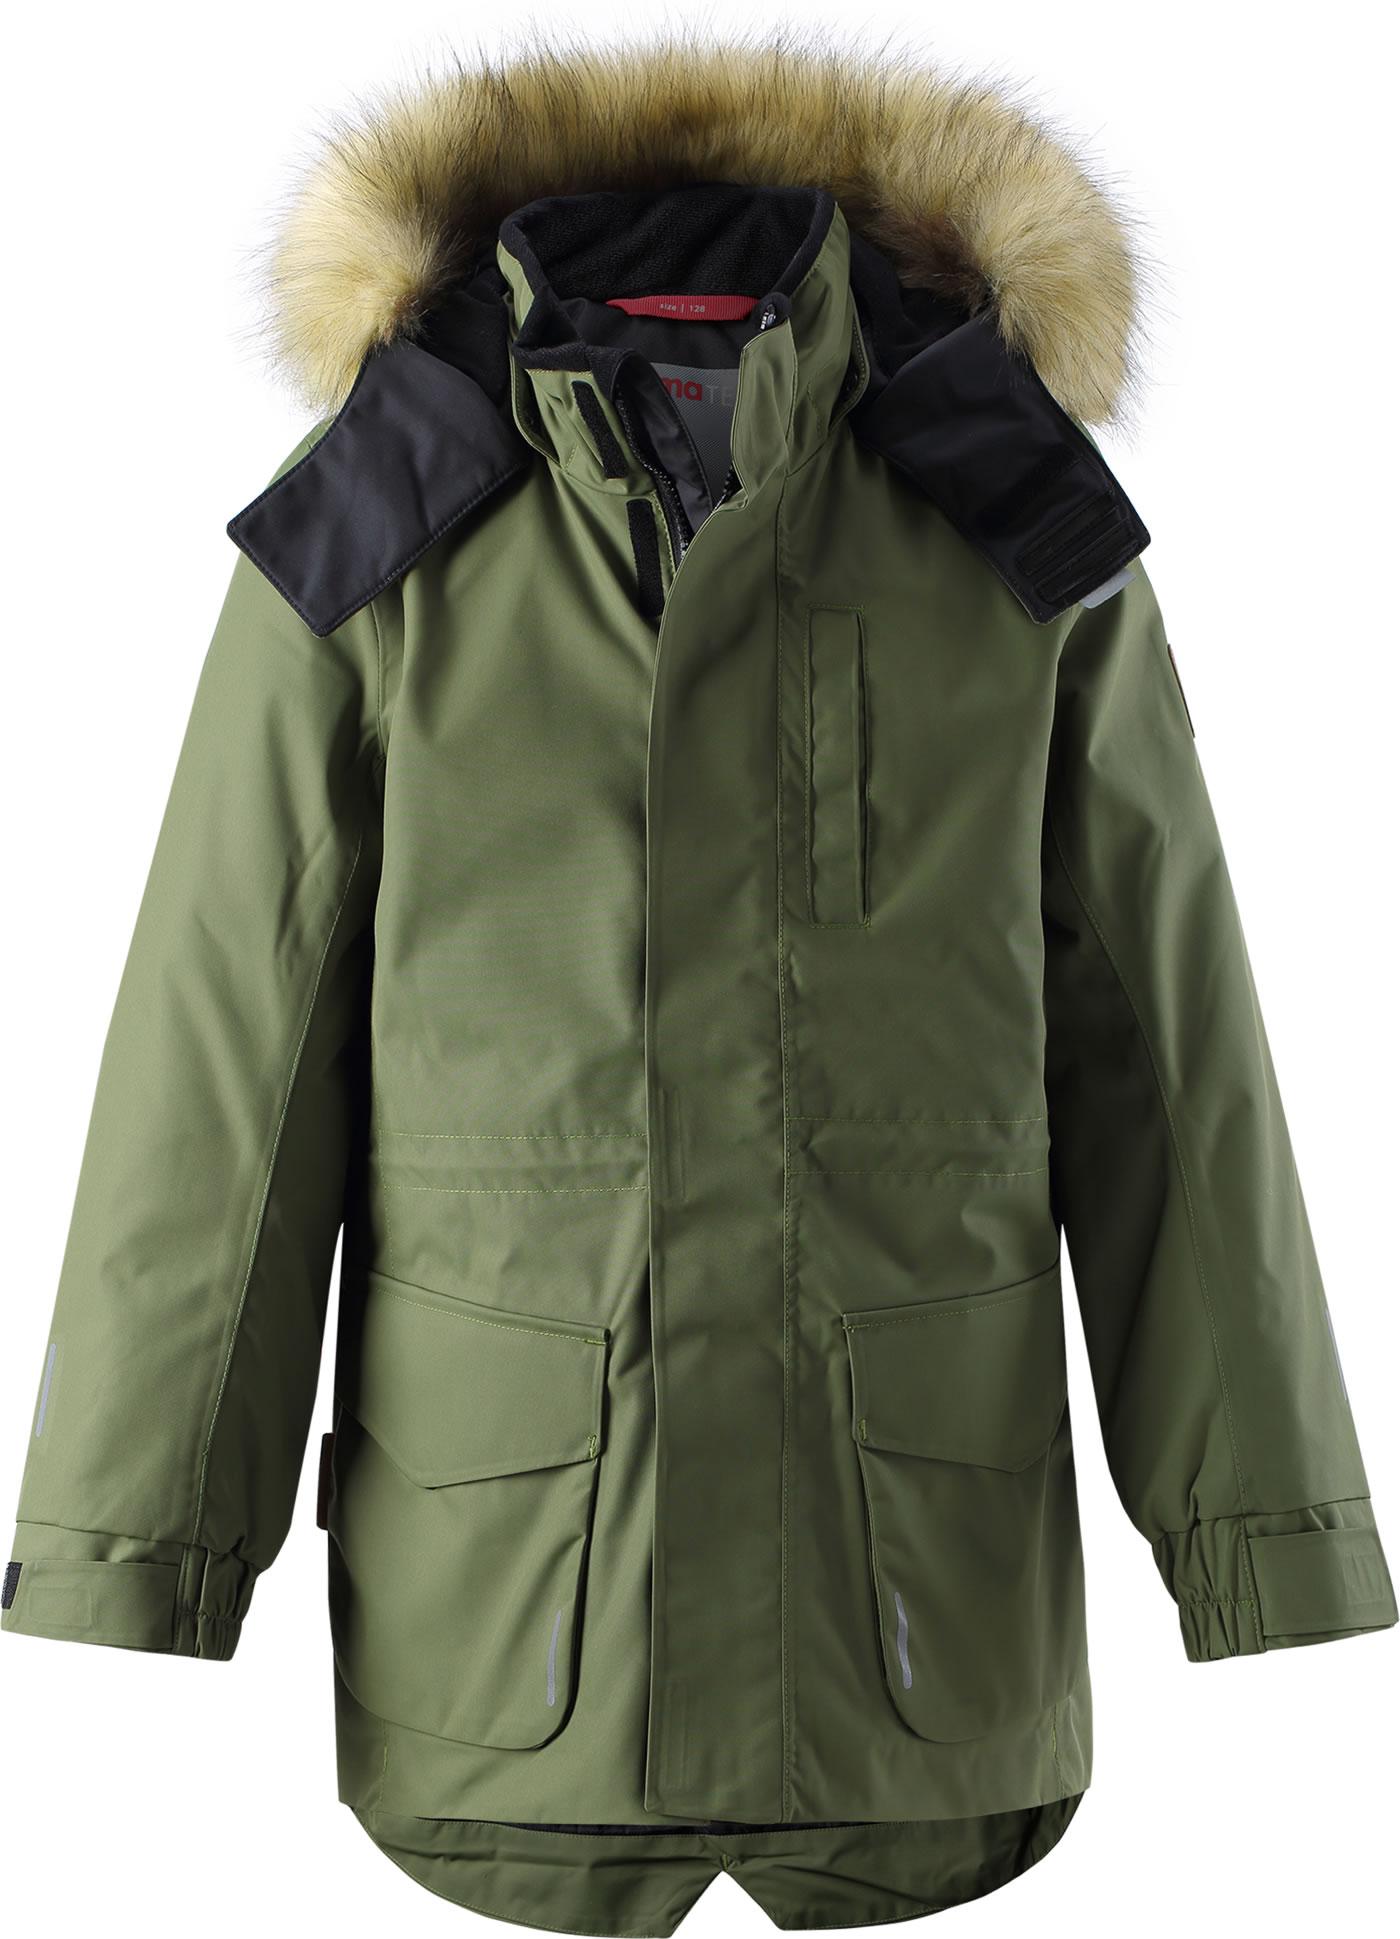 Reima Winterjacke Parka Reimatec® NAAPURI khaki green 531351 8930